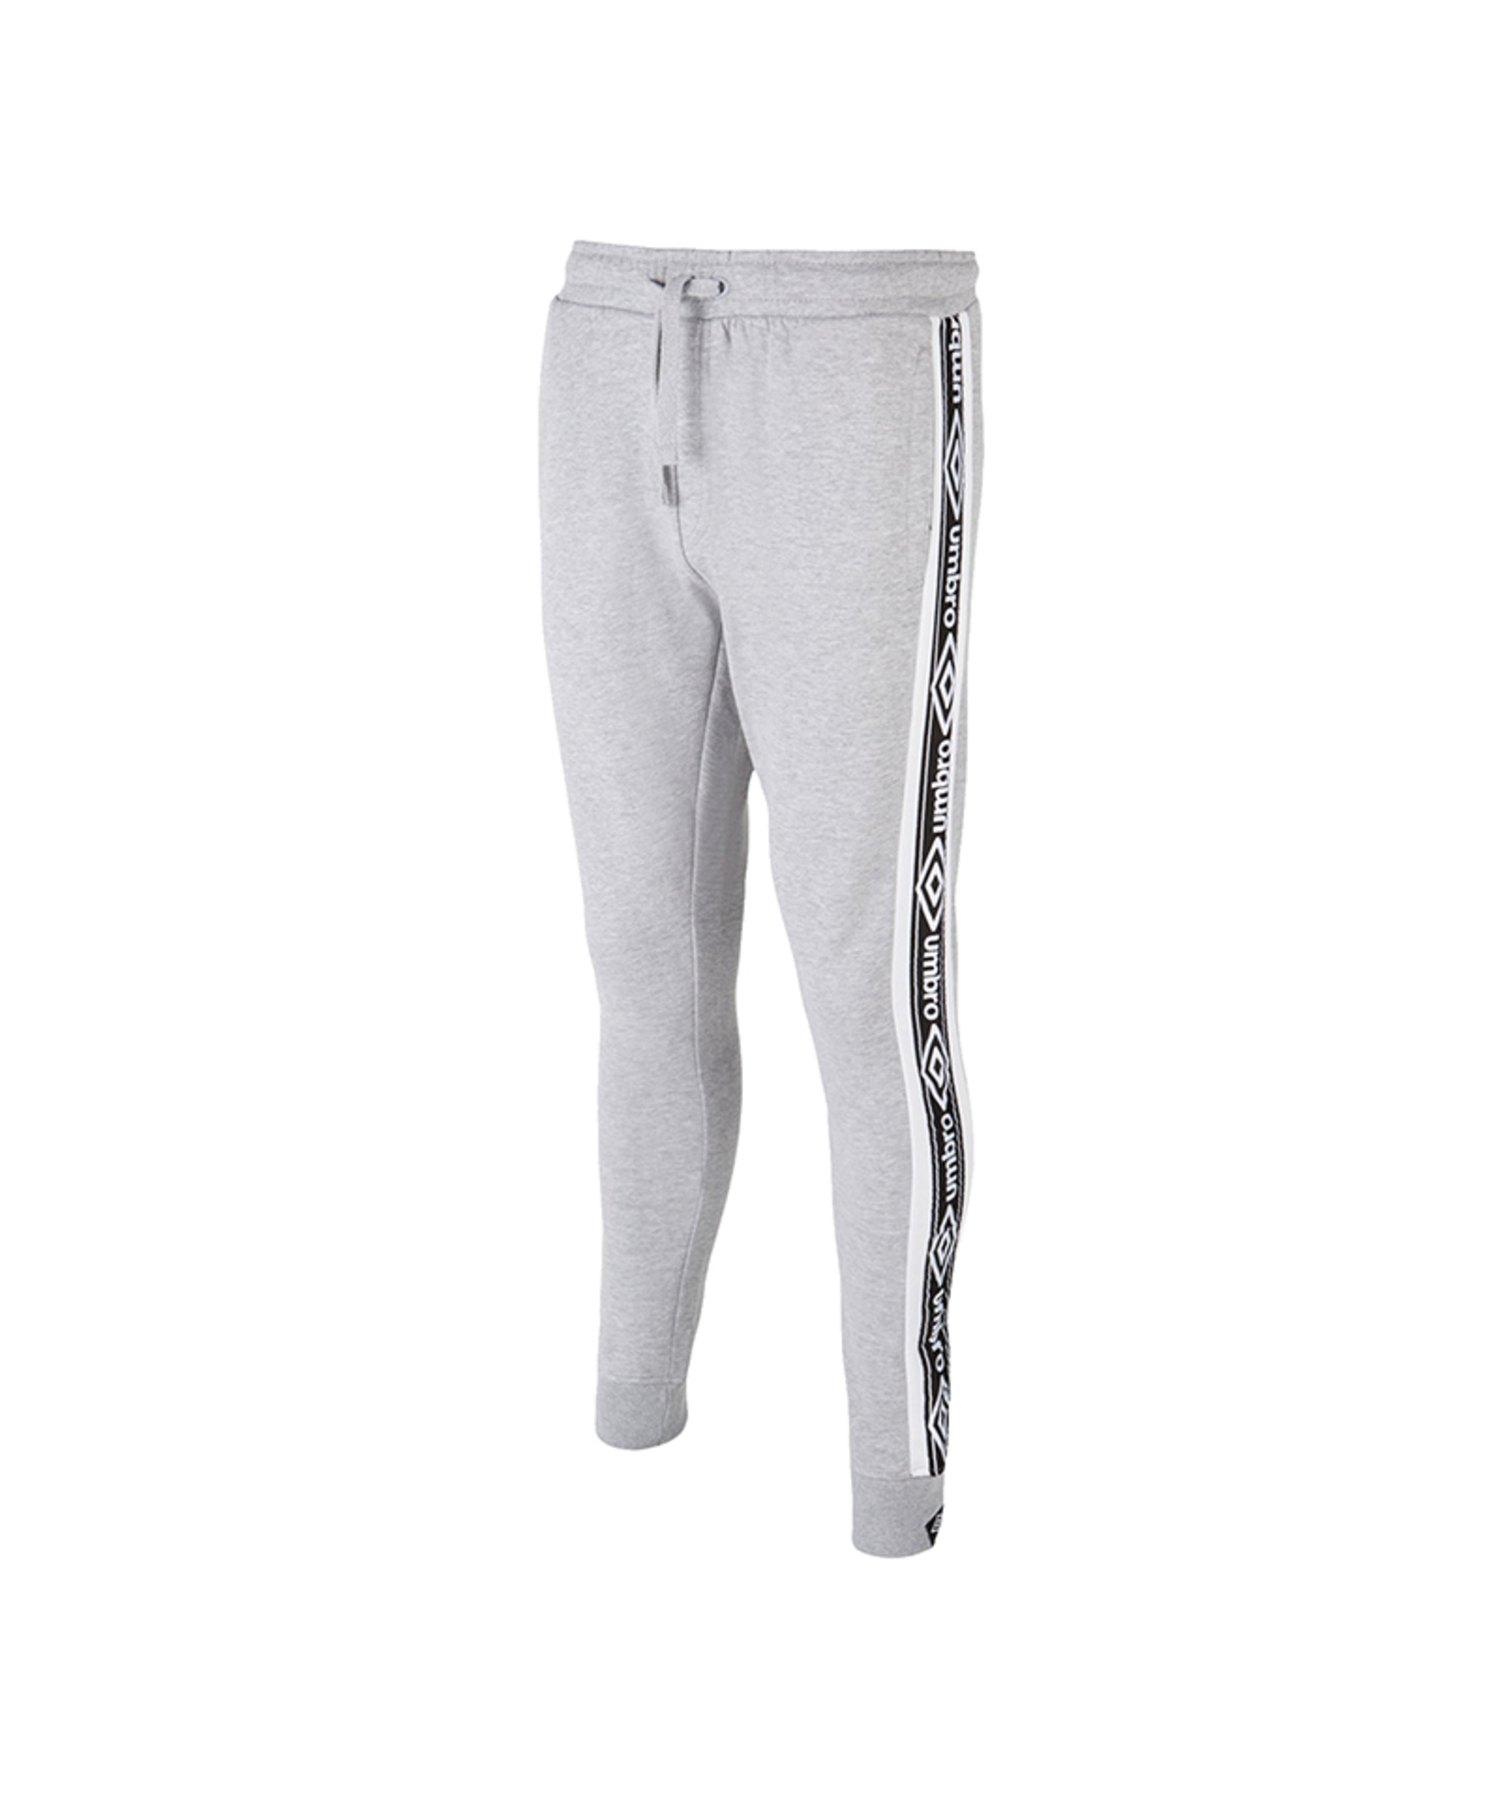 Umbro Taped Fleece Hose lang Grau FGT2 - Grau